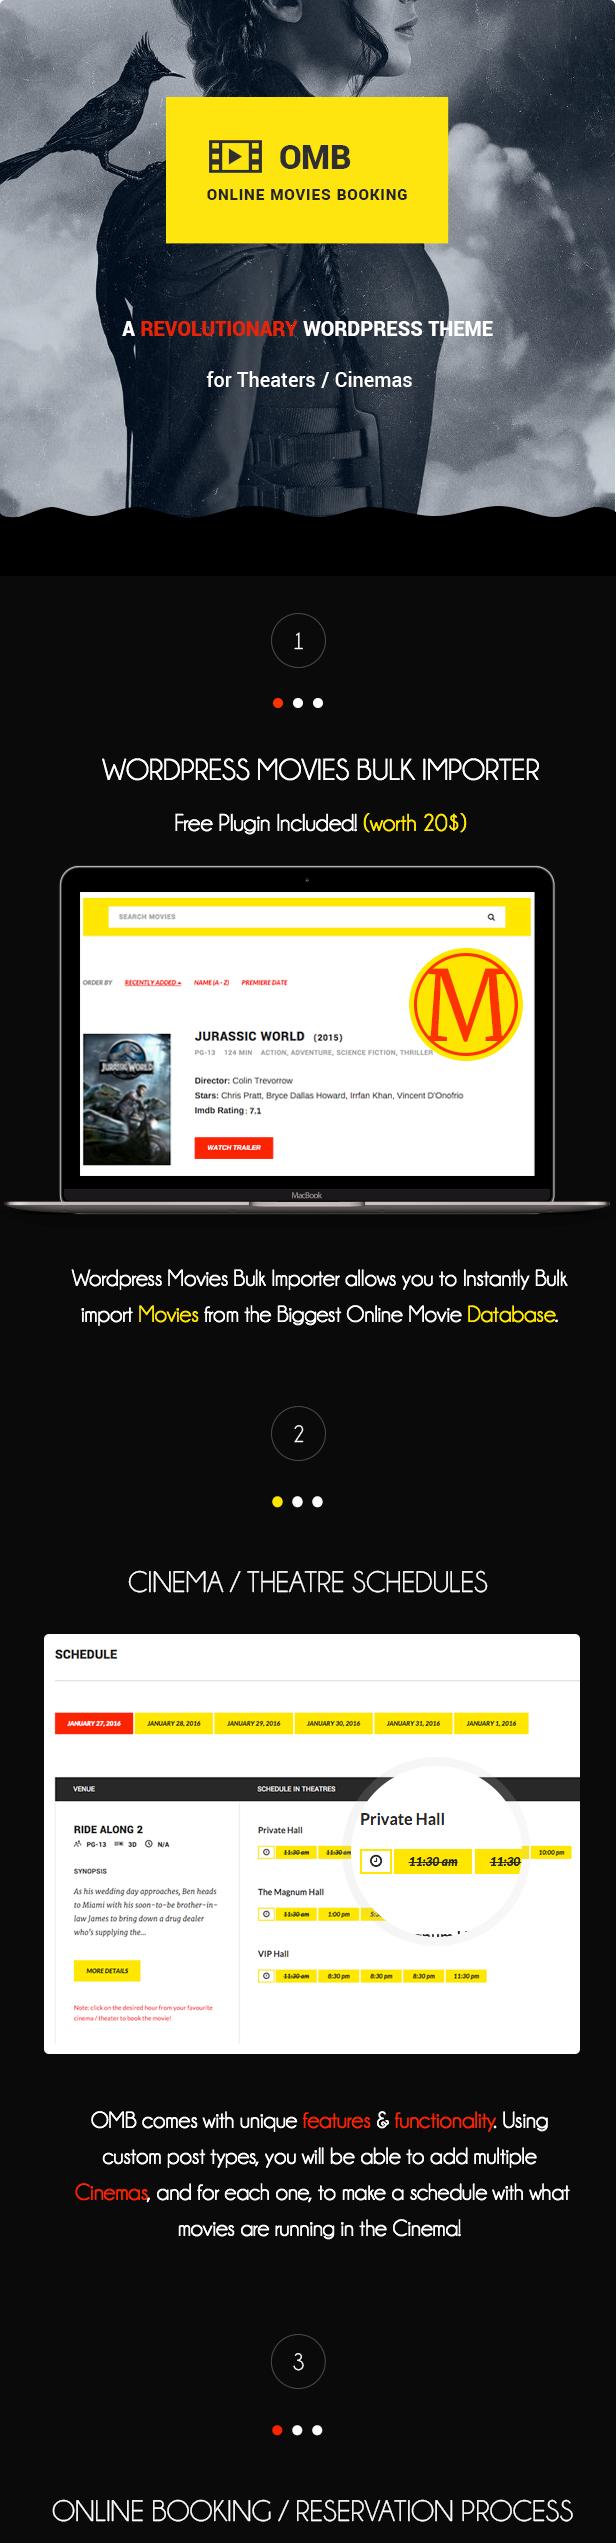 OMB - Online Movies Booking - 3 OMB - Online Movies Booking - omb - OMB – Online Movies Booking